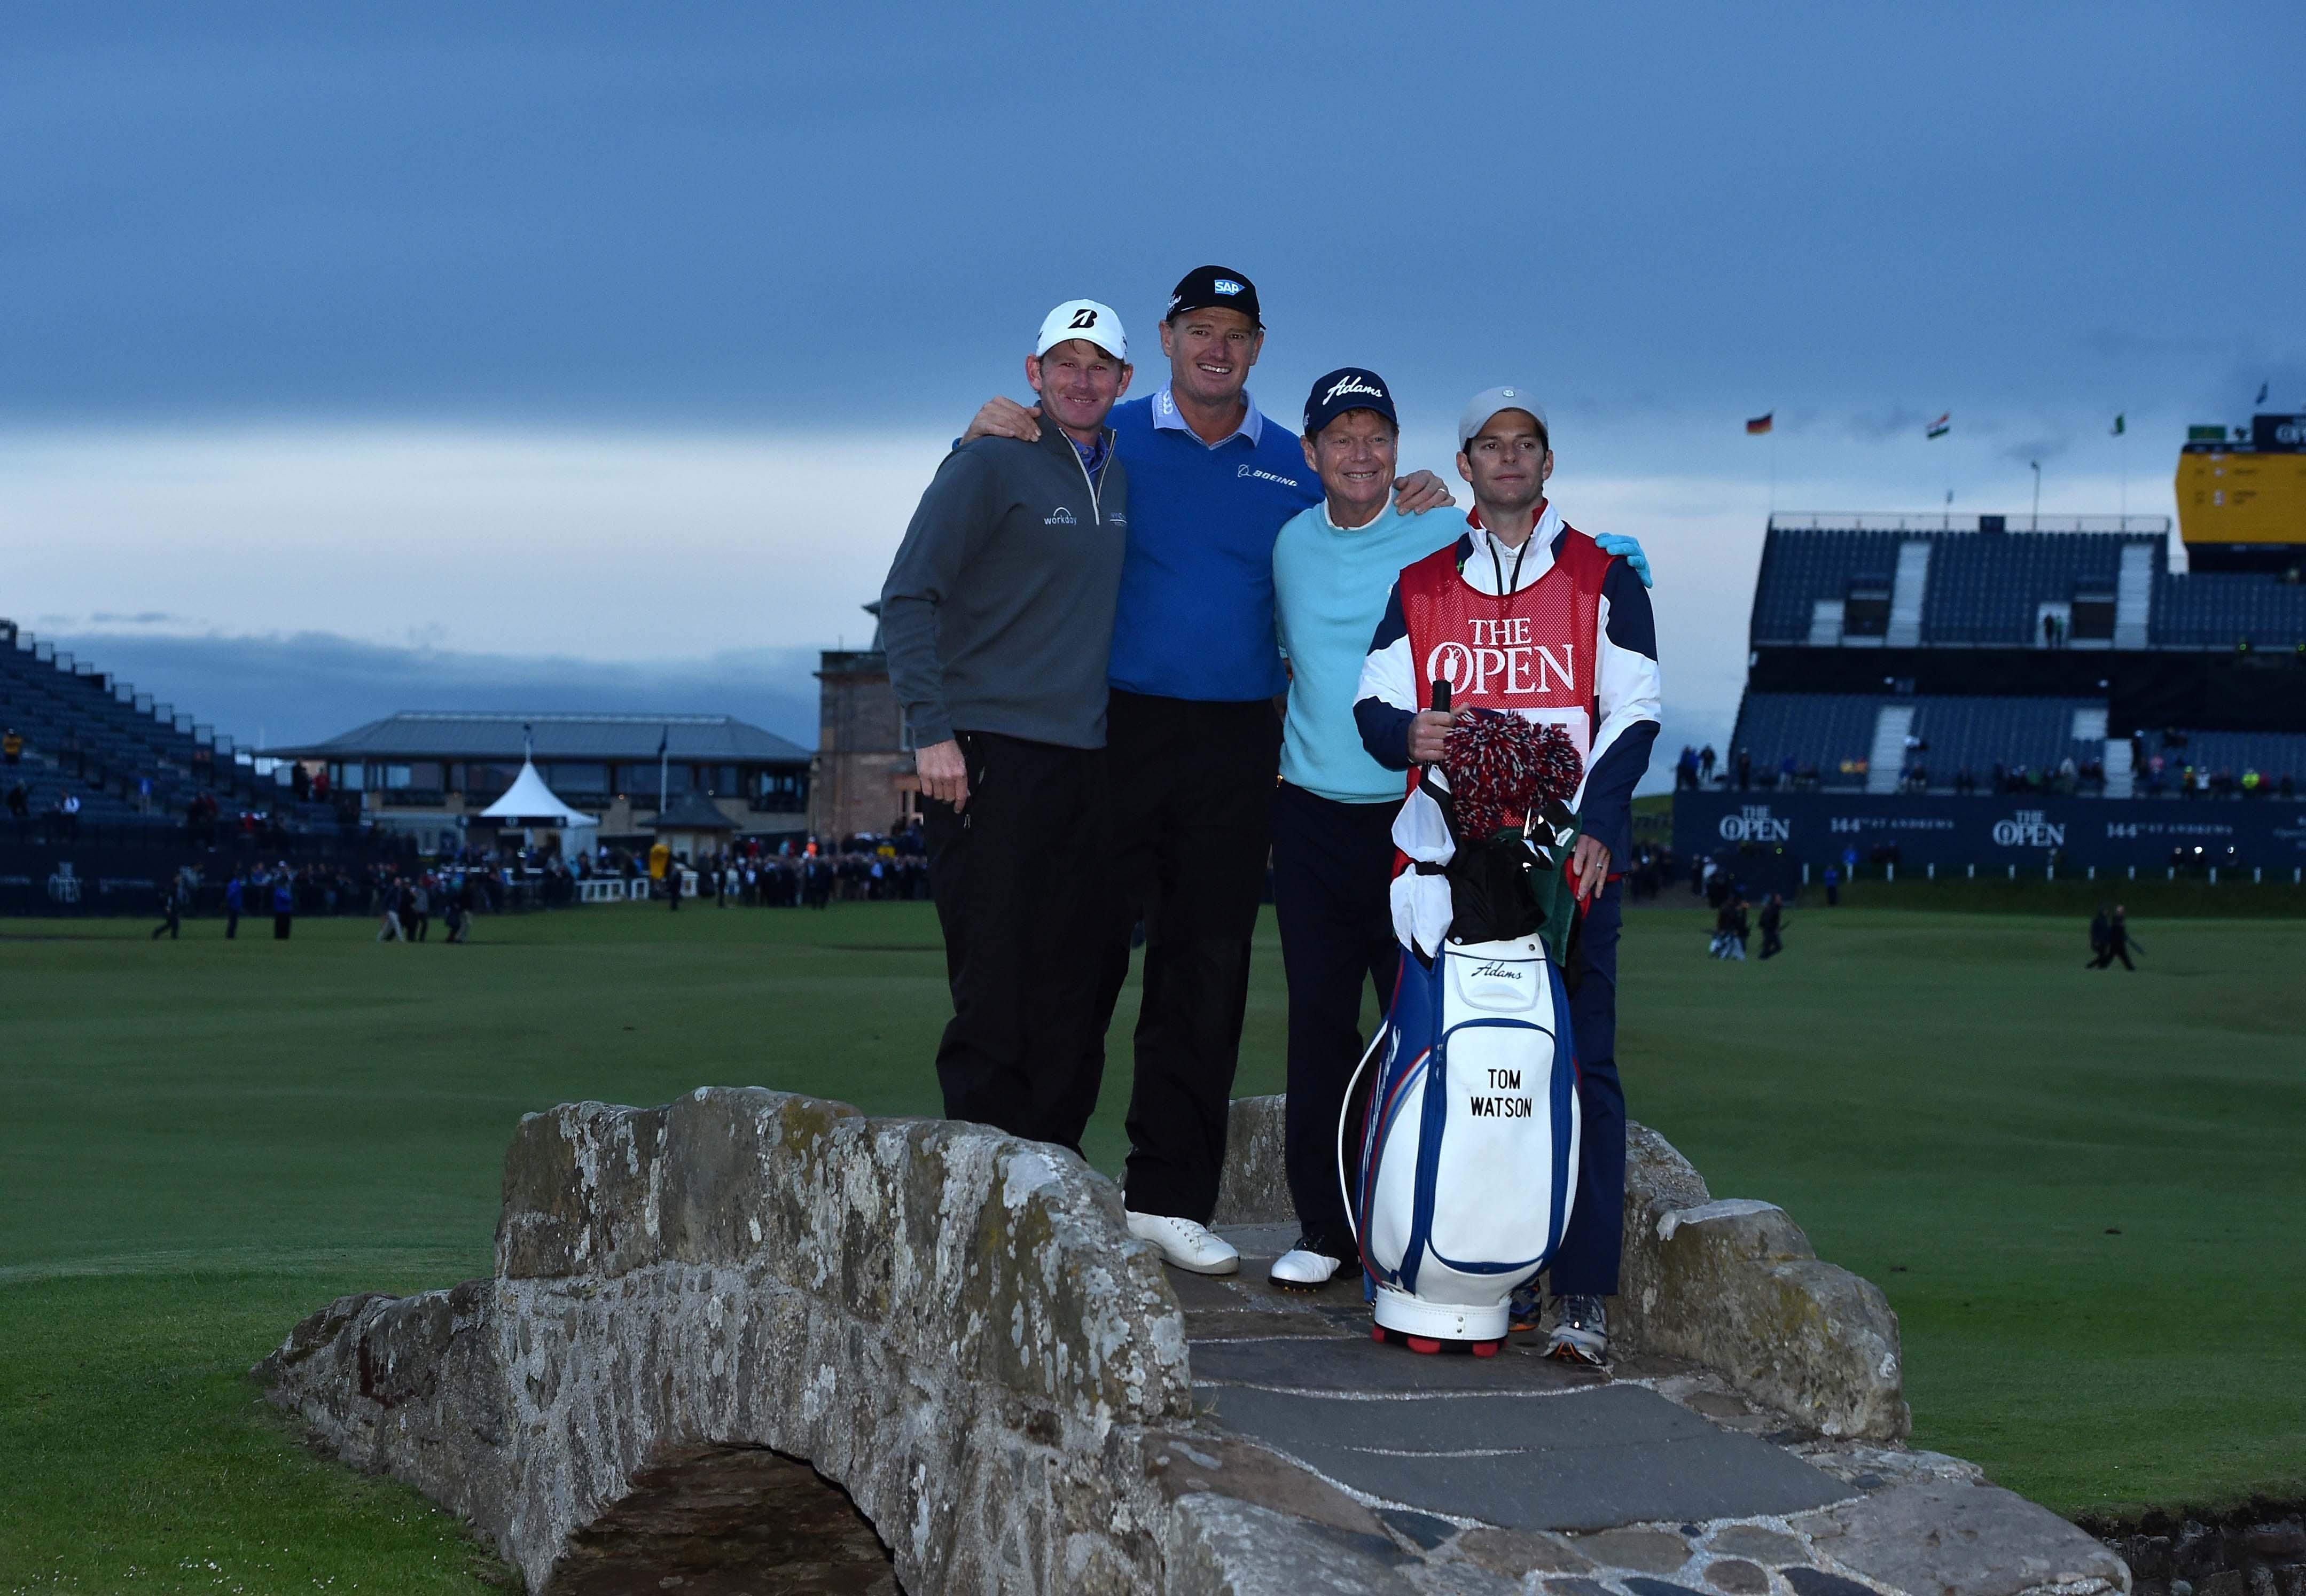 Ernie Els, Tom Watson and Brandt Snedeker, 2015 British Open